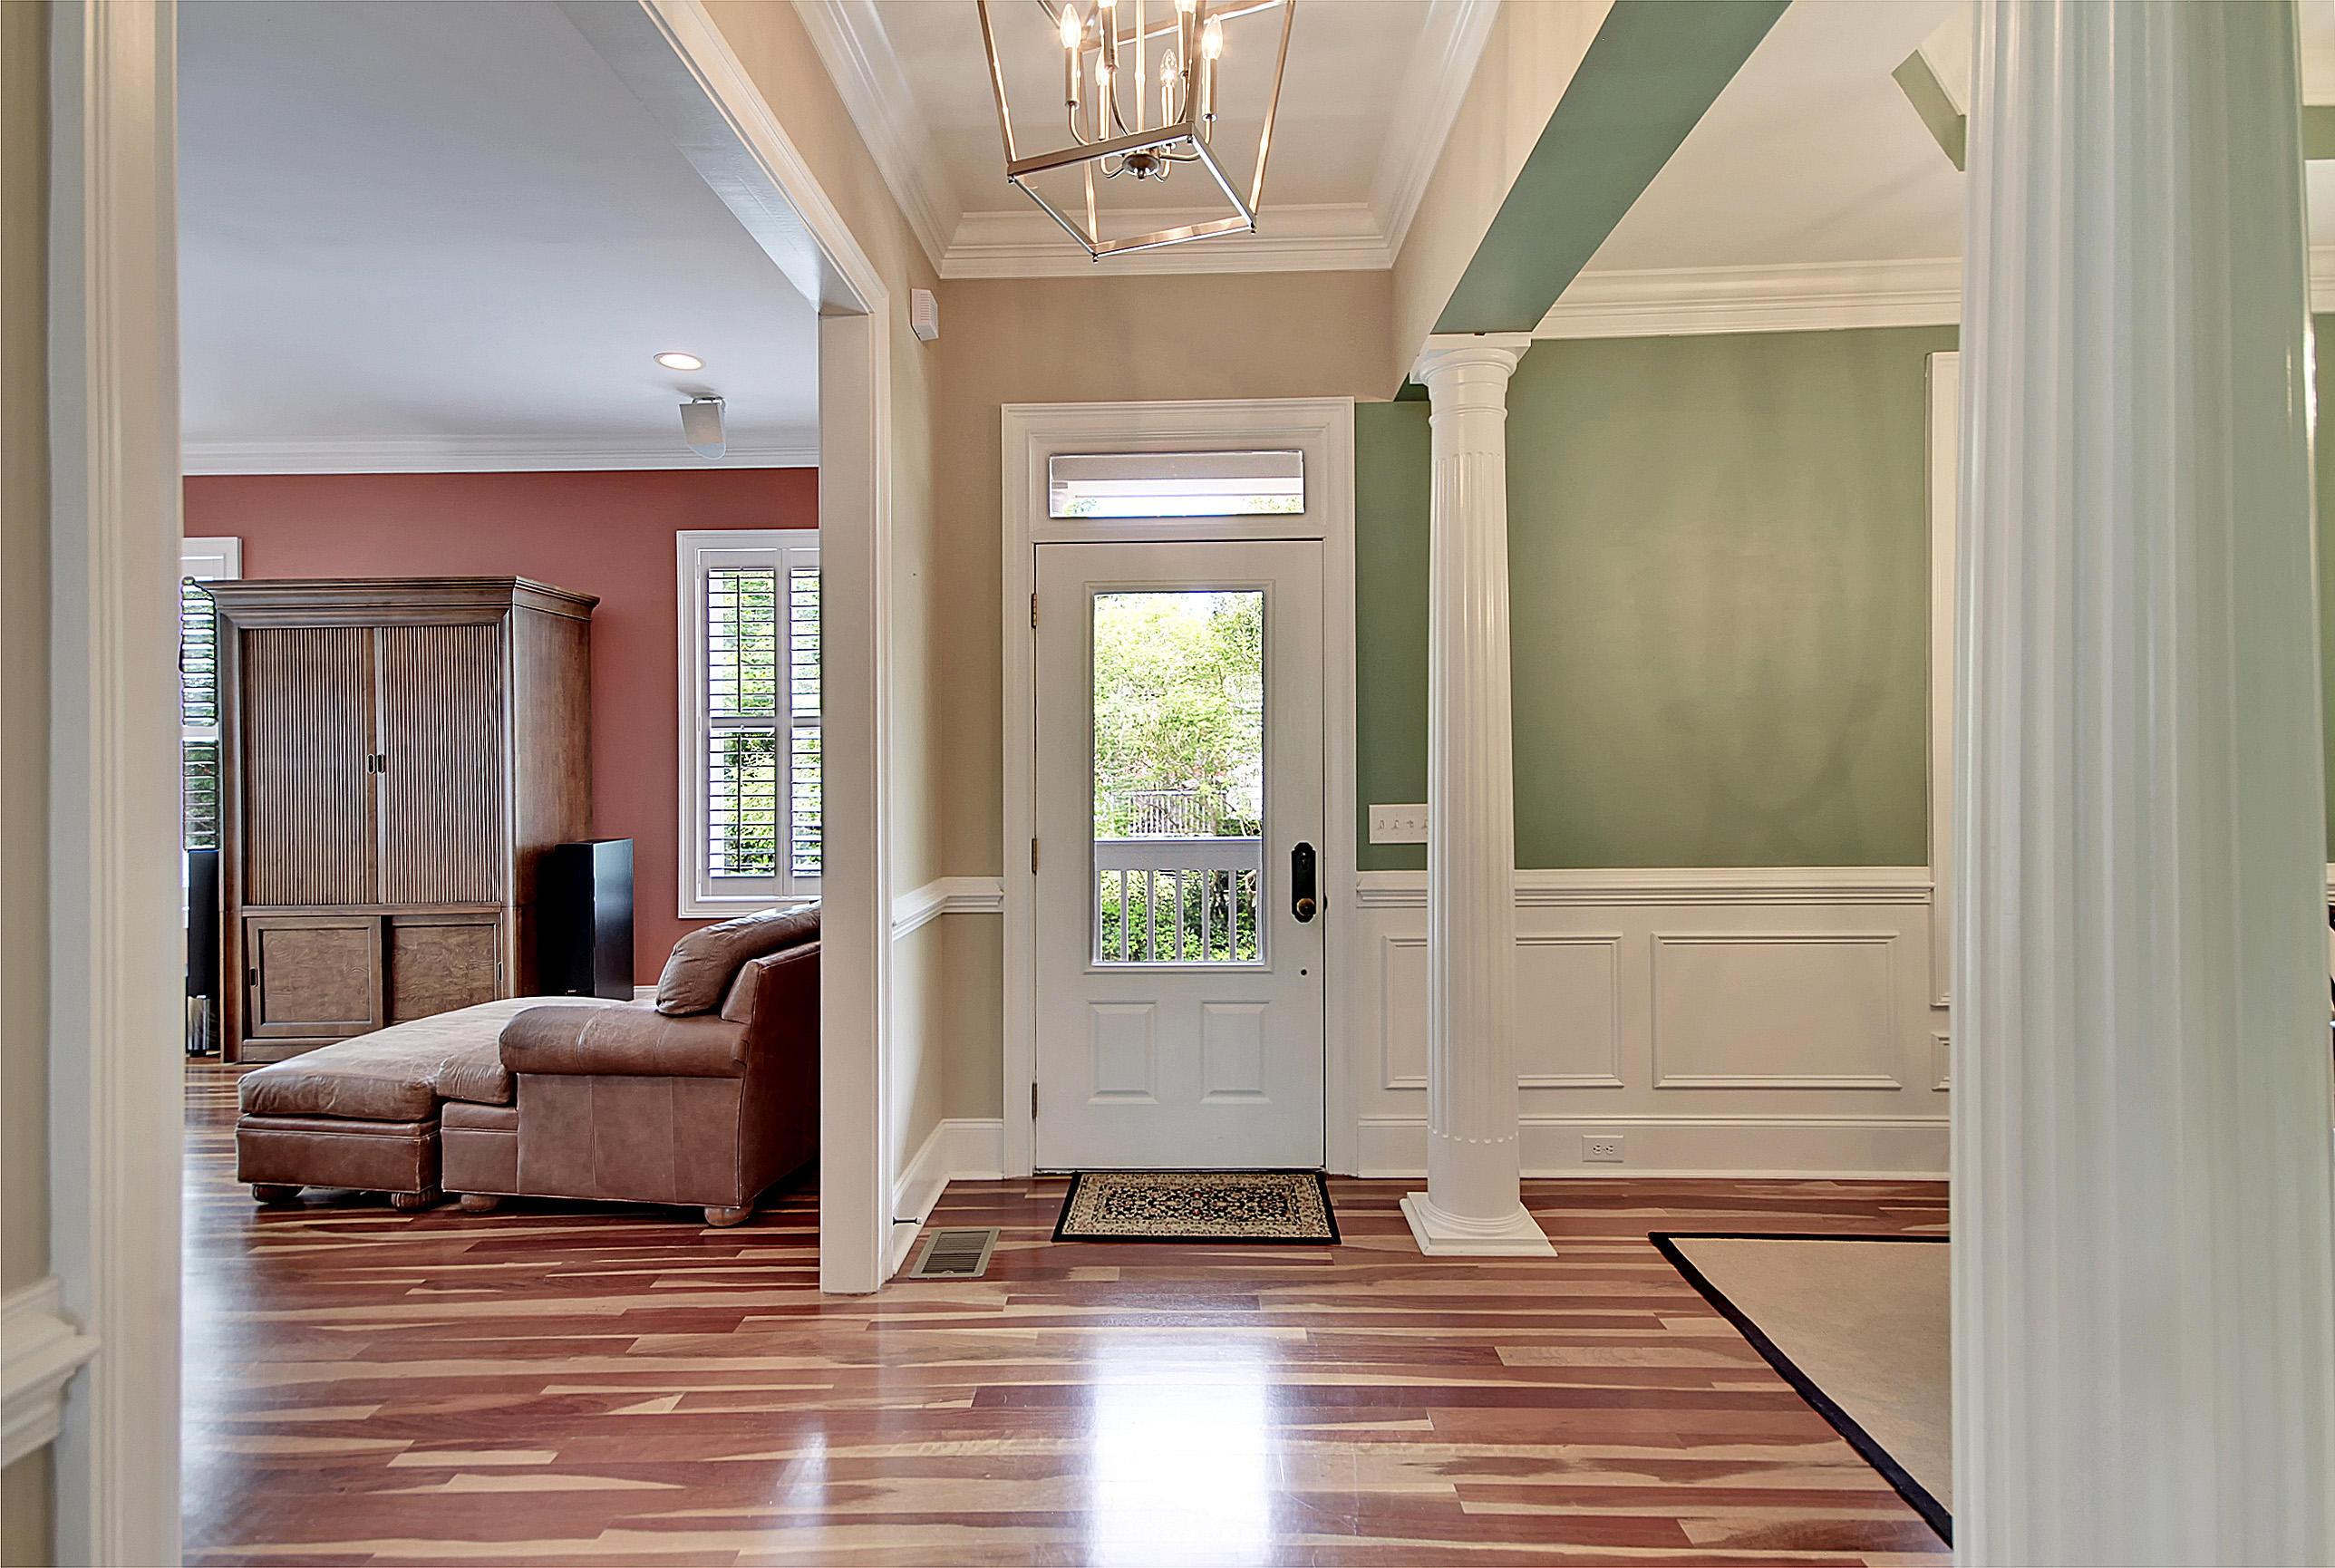 Belle Hall Homes For Sale - 368 Evian, Mount Pleasant, SC - 11